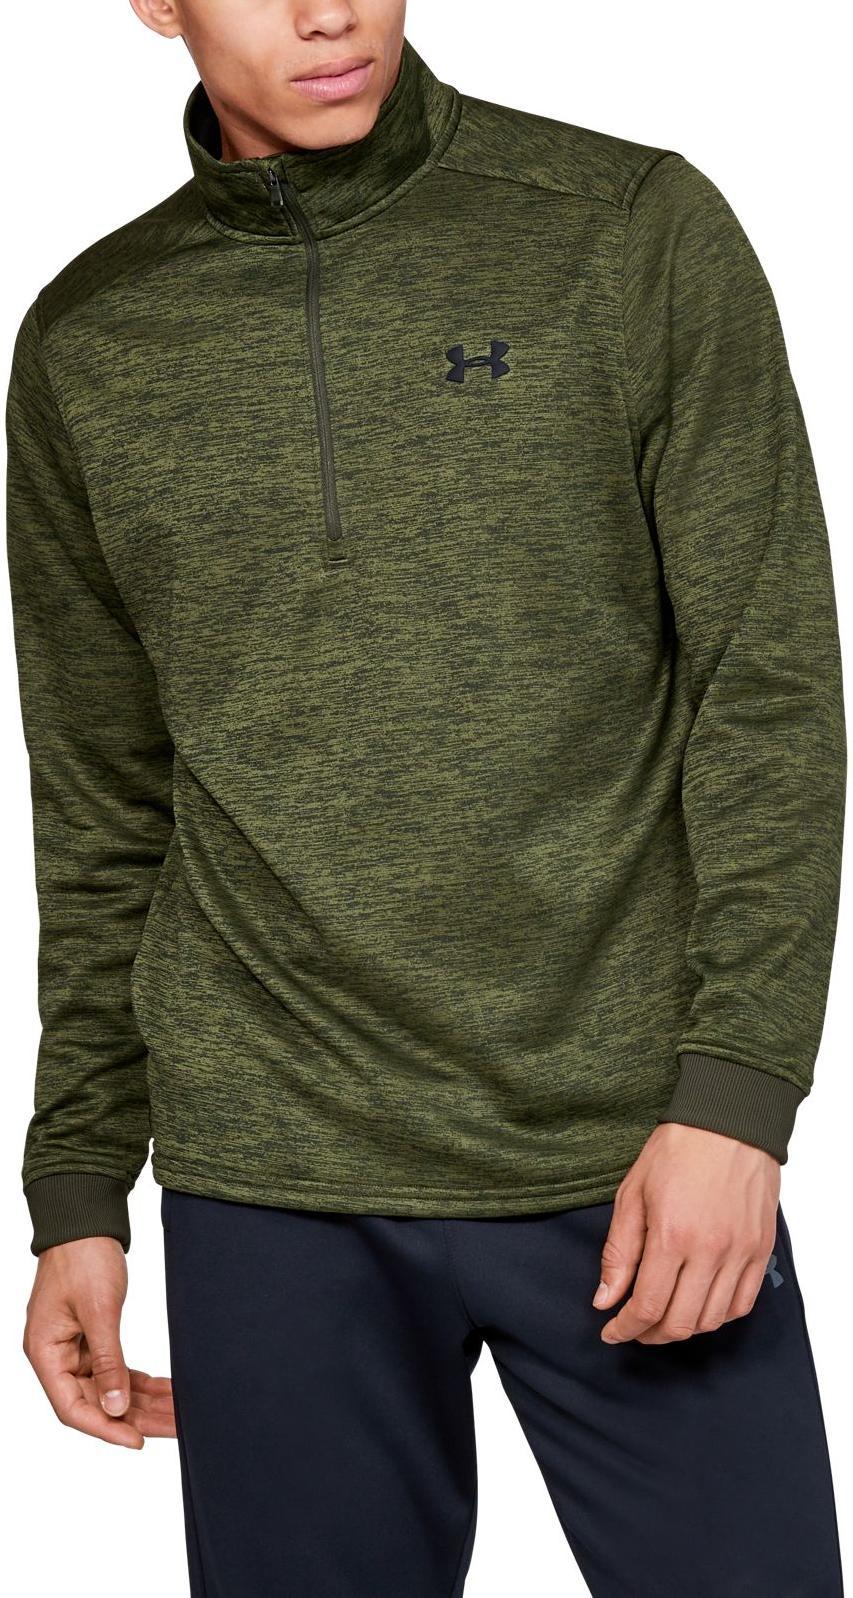 madera emulsión Organo  Long-sleeve T-shirt Under Armour ARMOUR FLEECE 1/2 ZIP - Top4Fitness.com